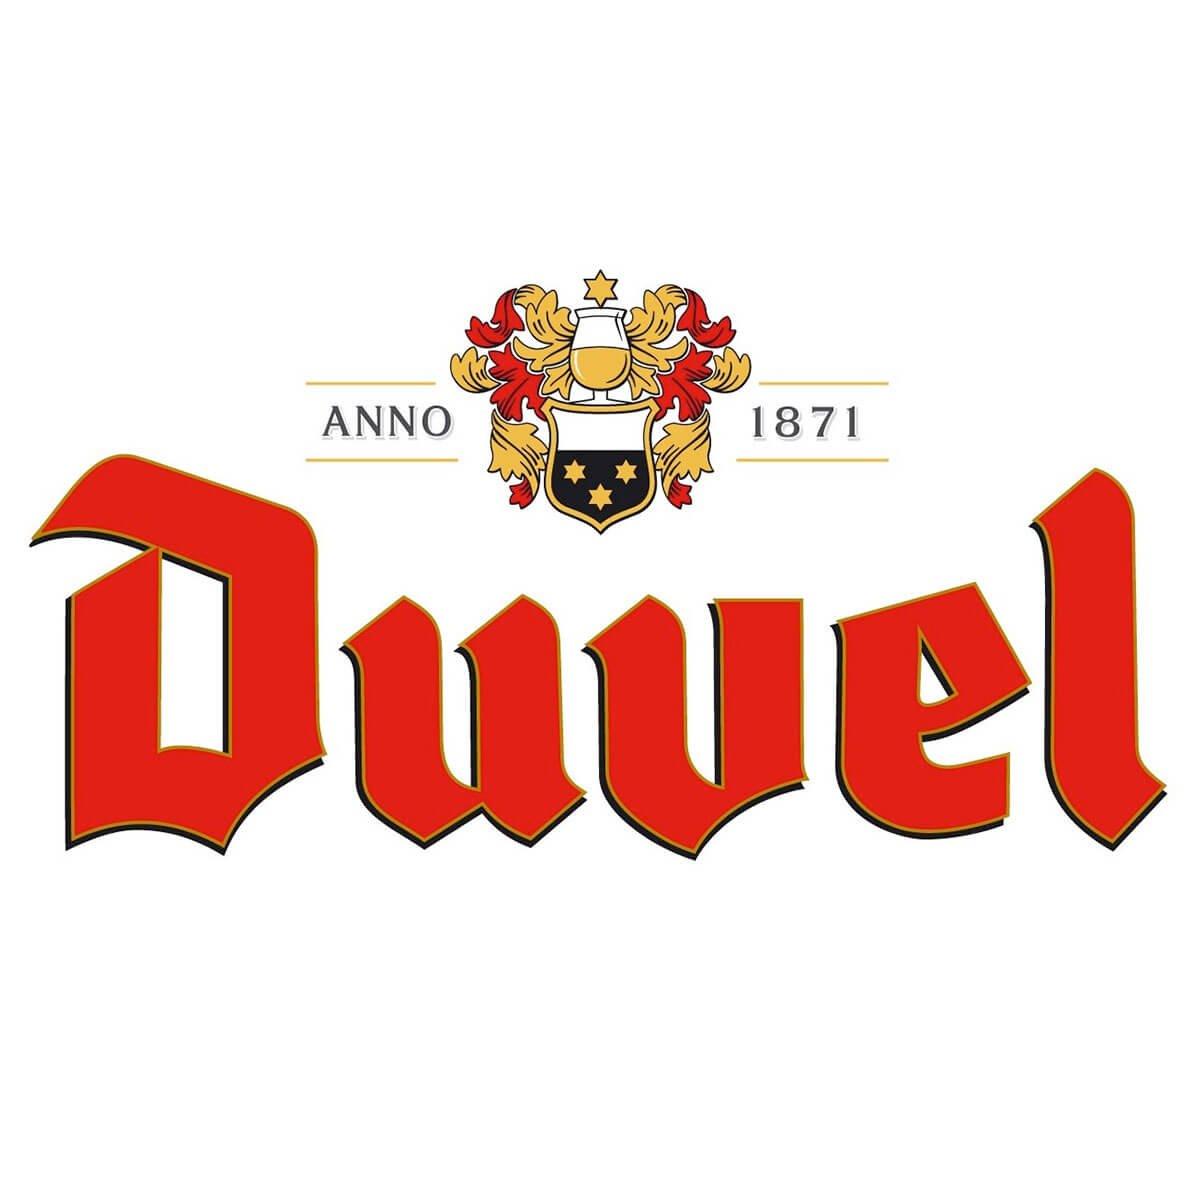 Duvel Moortgat Logo